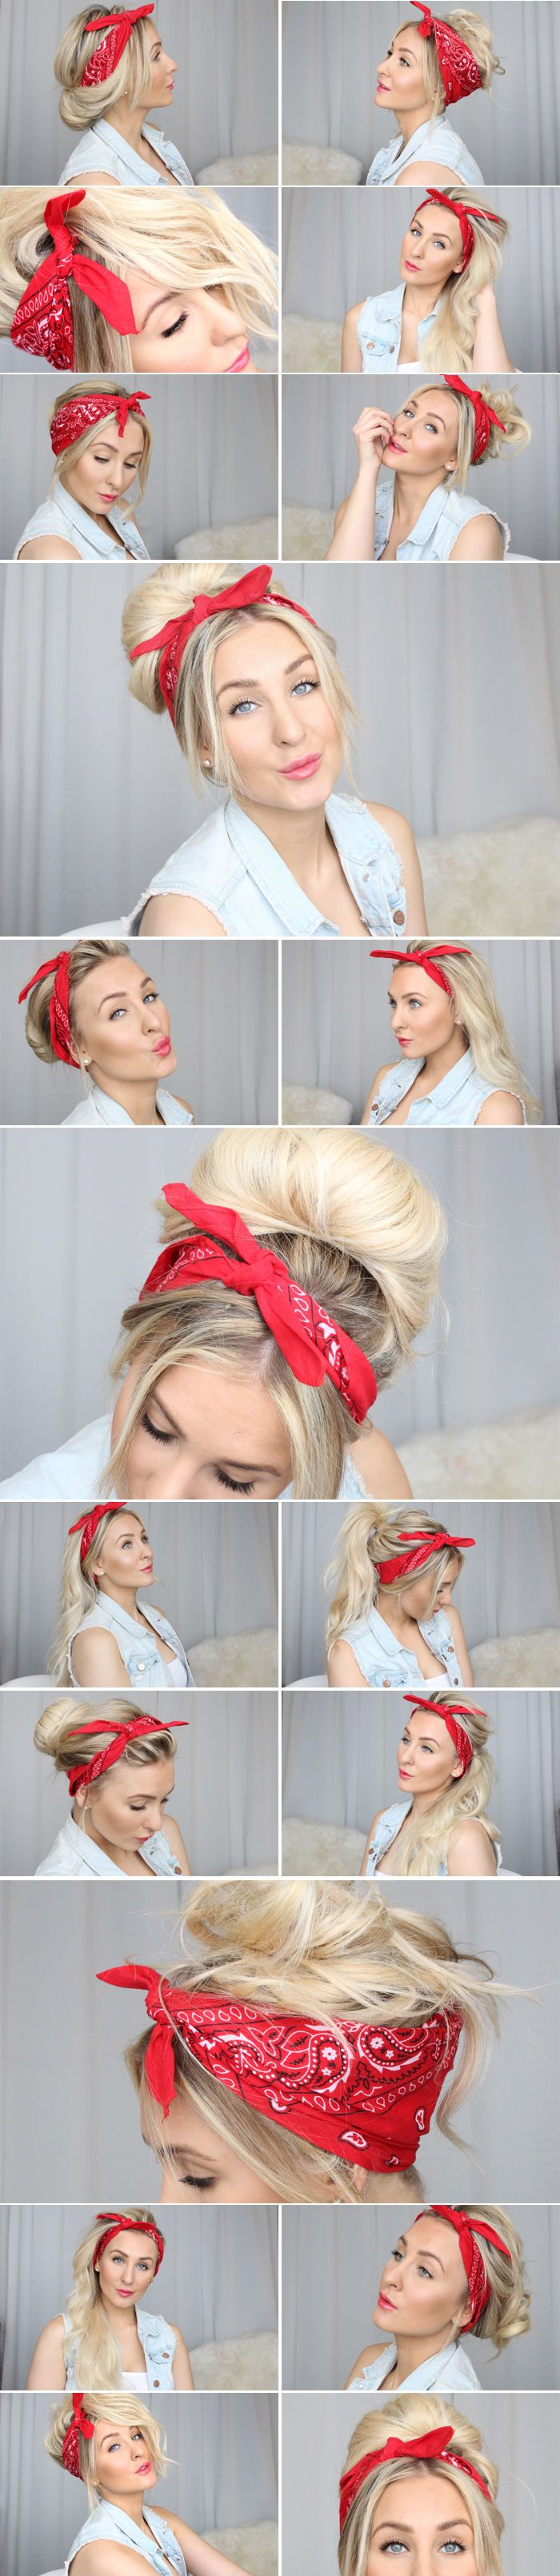 How To Use A Bandana For Your Hair hair long hair diy hair hairstyles bandana ha…